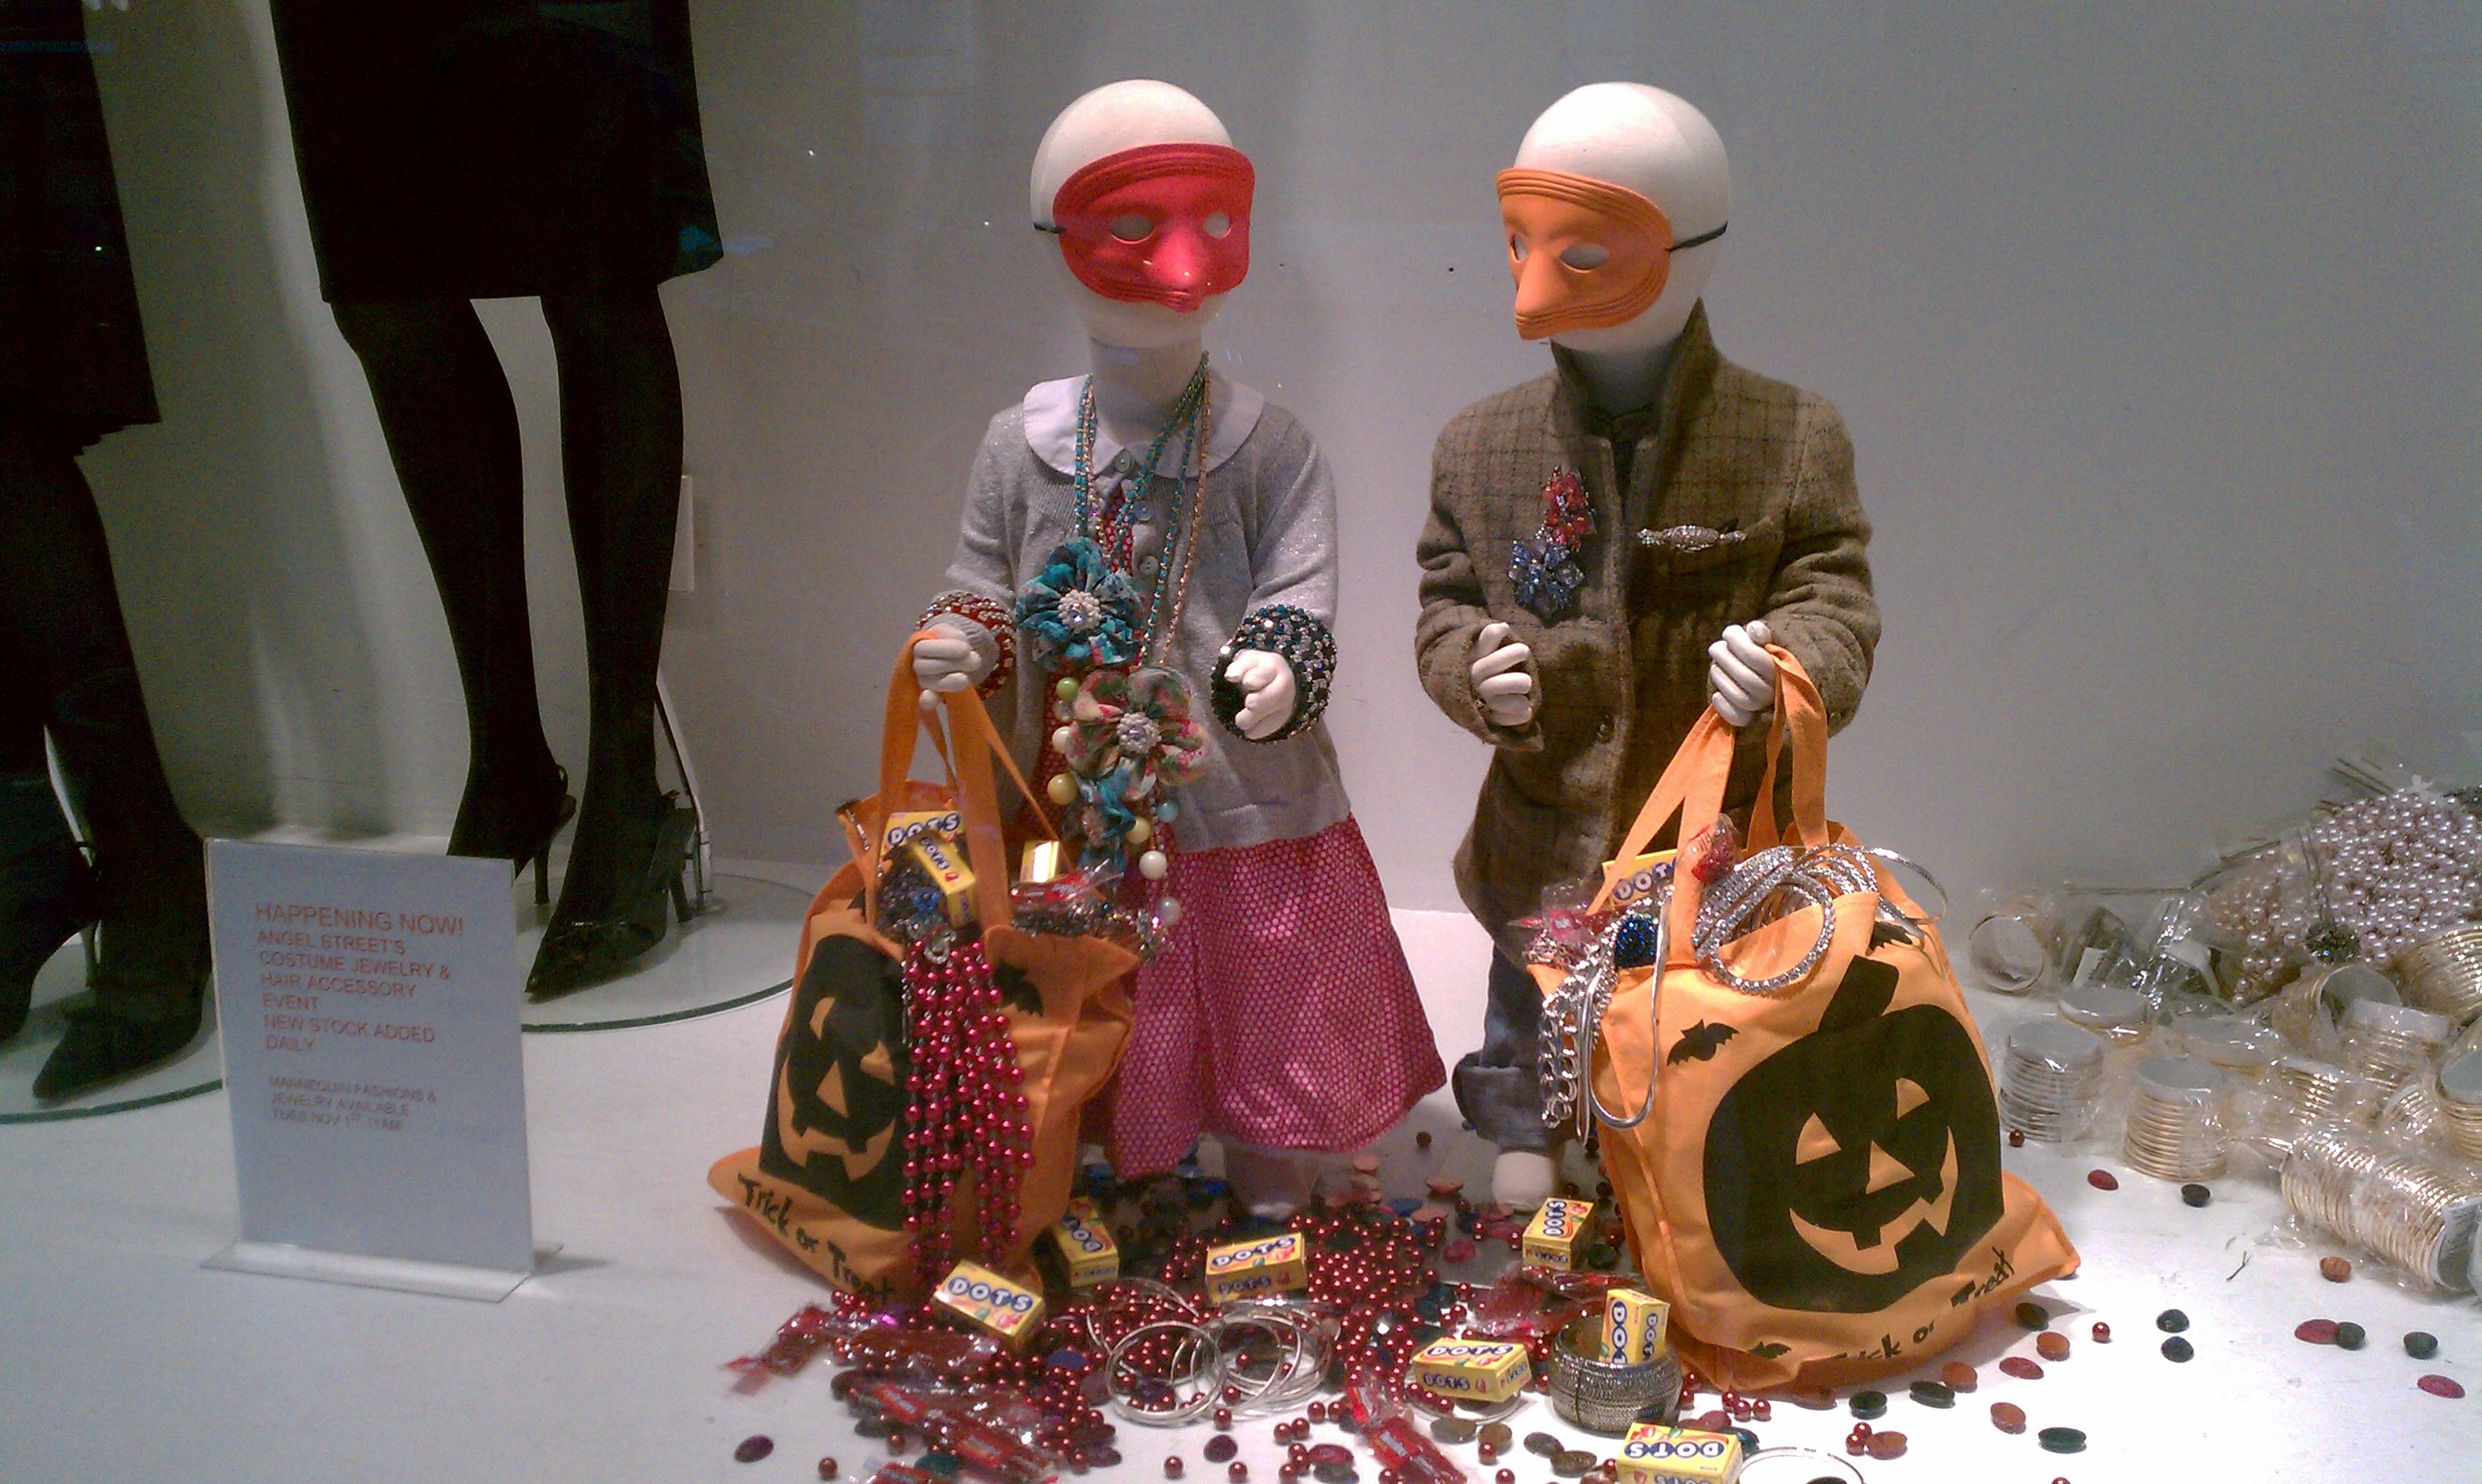 mannequinmadnes halloween displays mannequins